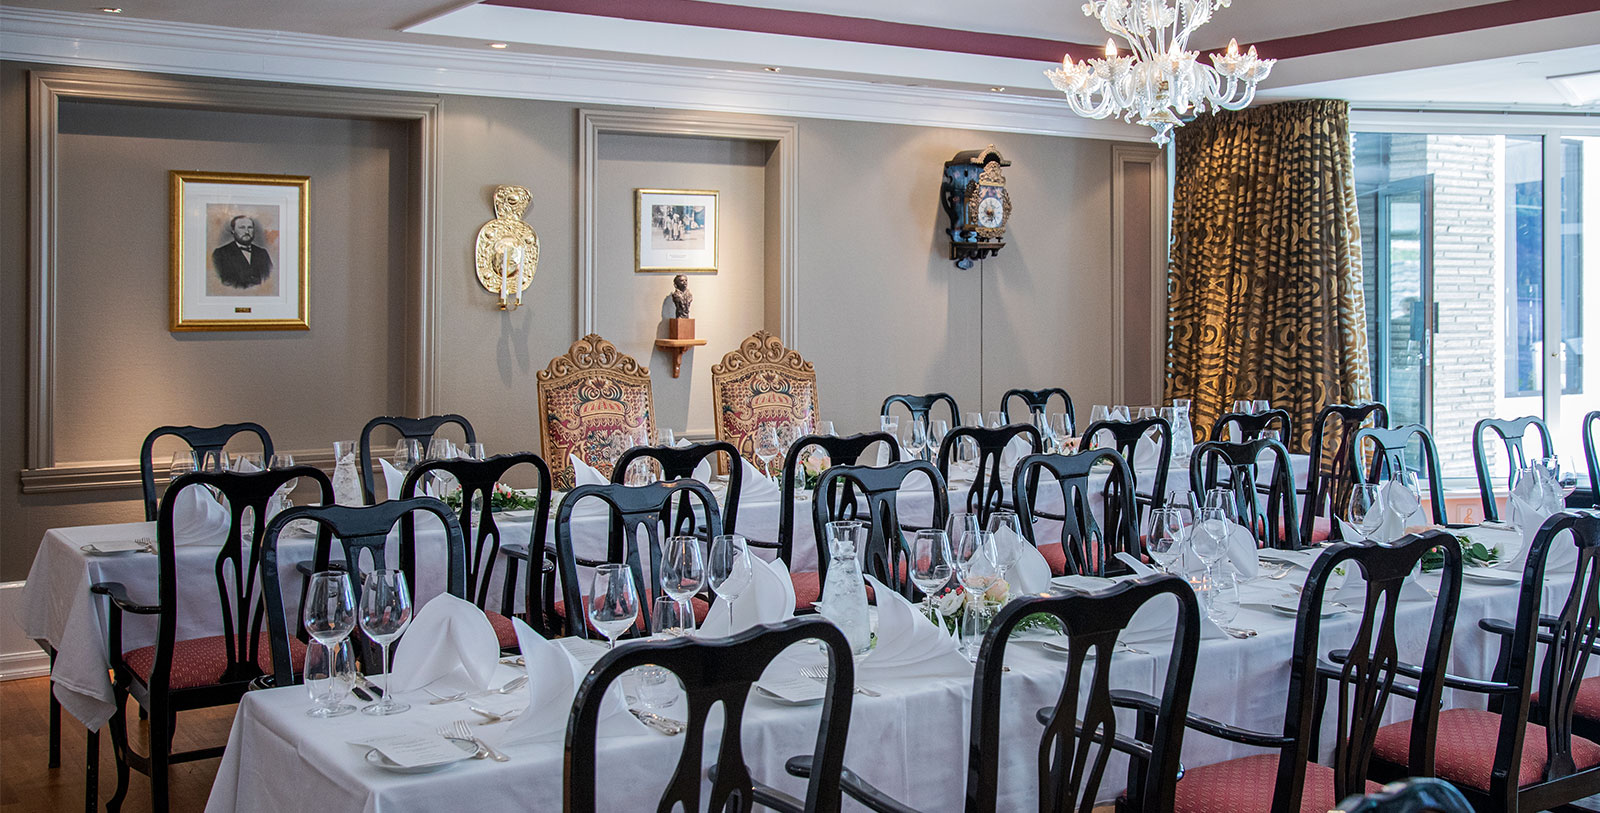 Image of Wedding Reception, Hotel Ullensvang, Lofthus, Norway, 1846, Member of Historic Hotels Worldwide, Weddings